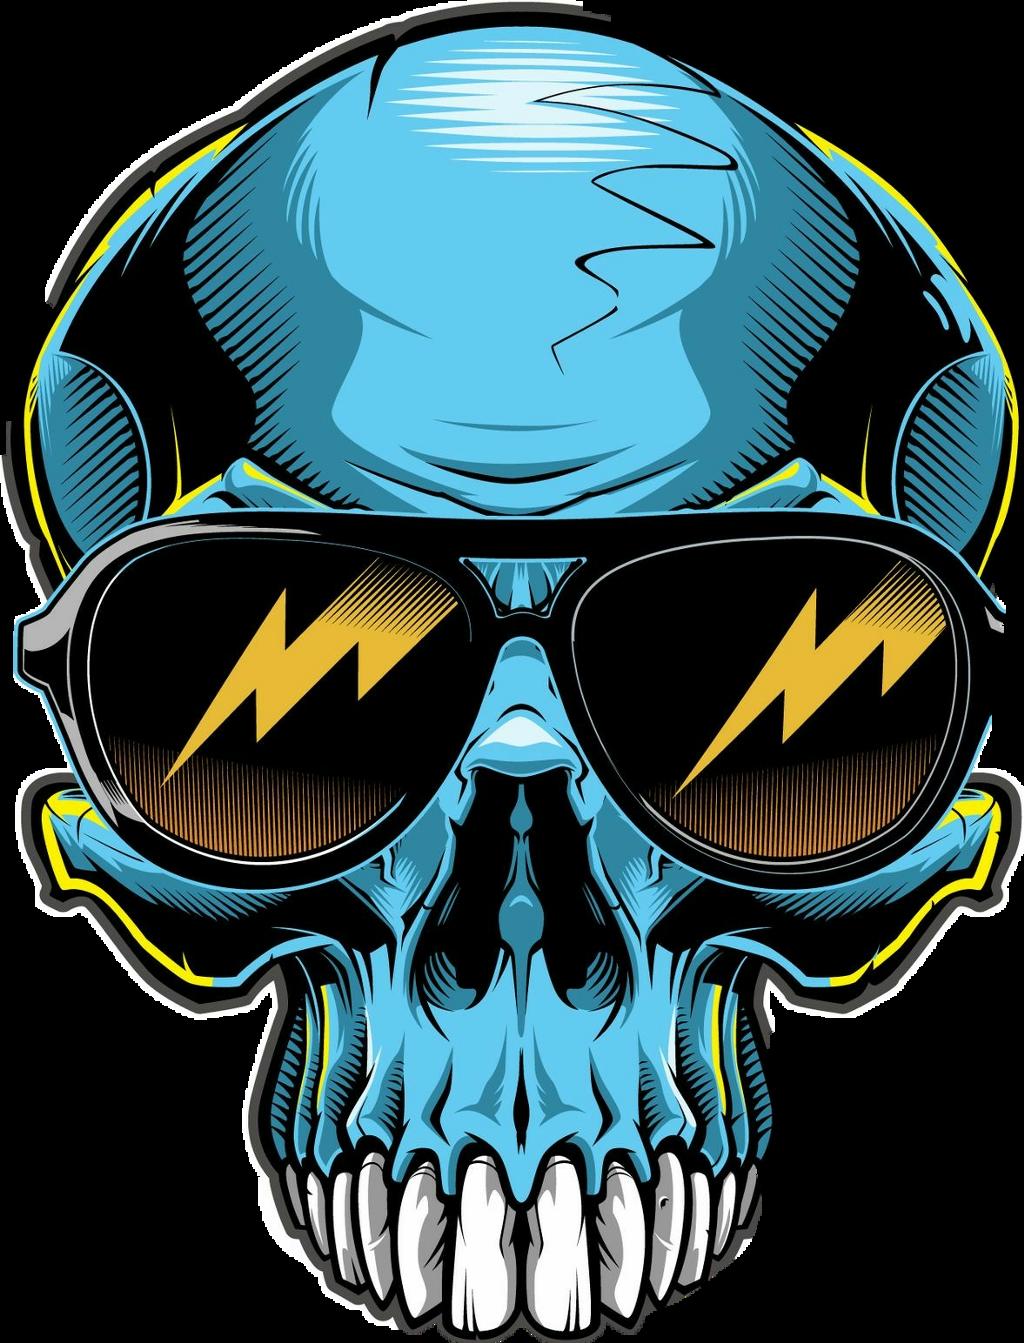 Skull Motorcycle Helmet Stickers